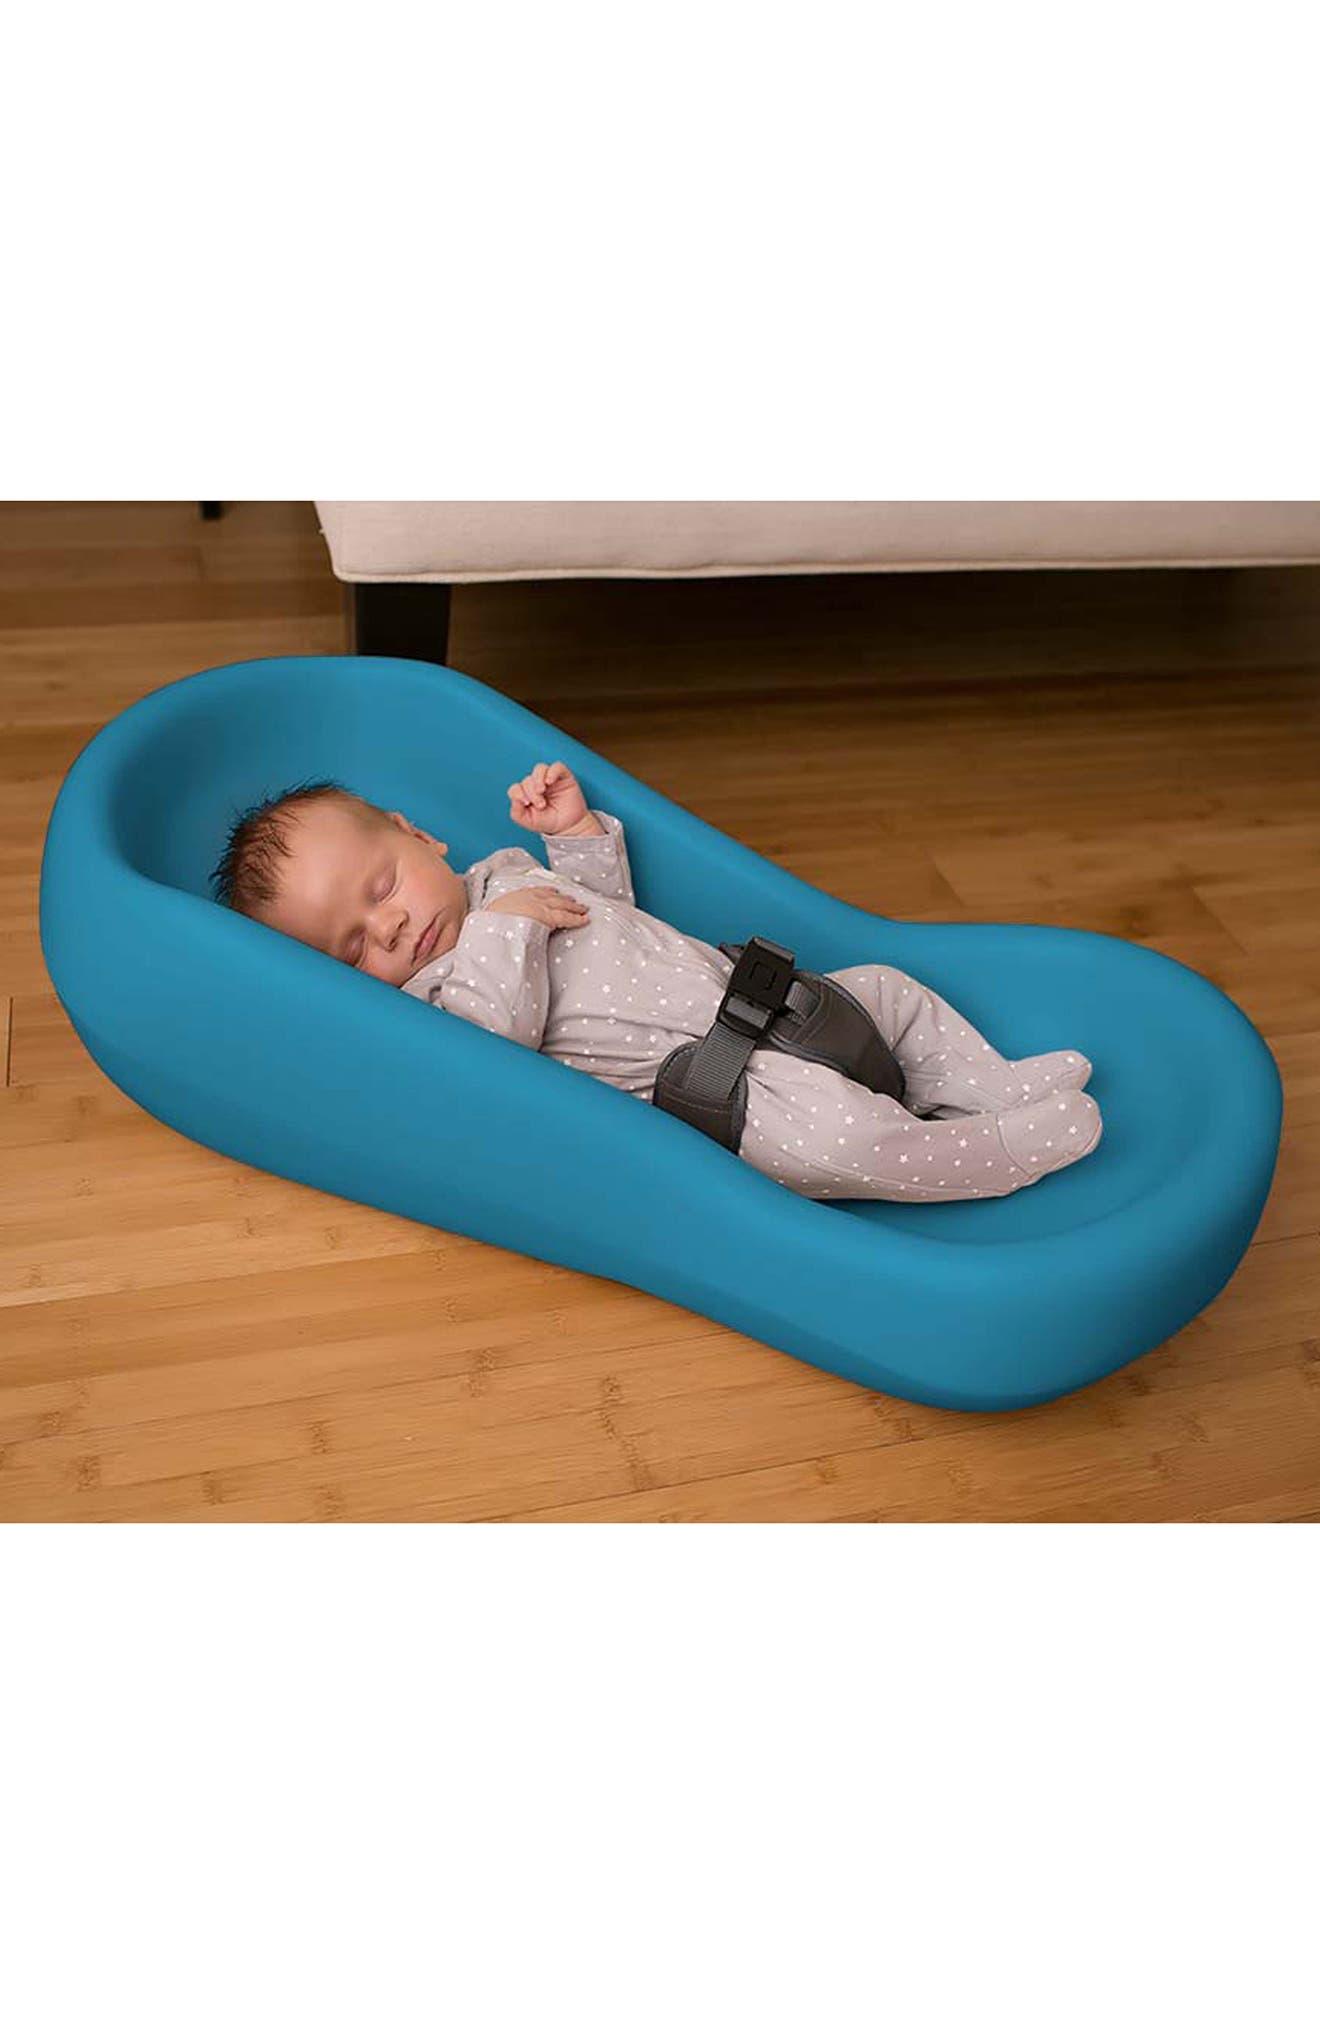 Snoozer<sup>®</sup> Infant Lounger,                             Alternate thumbnail 2, color,                             Aqua